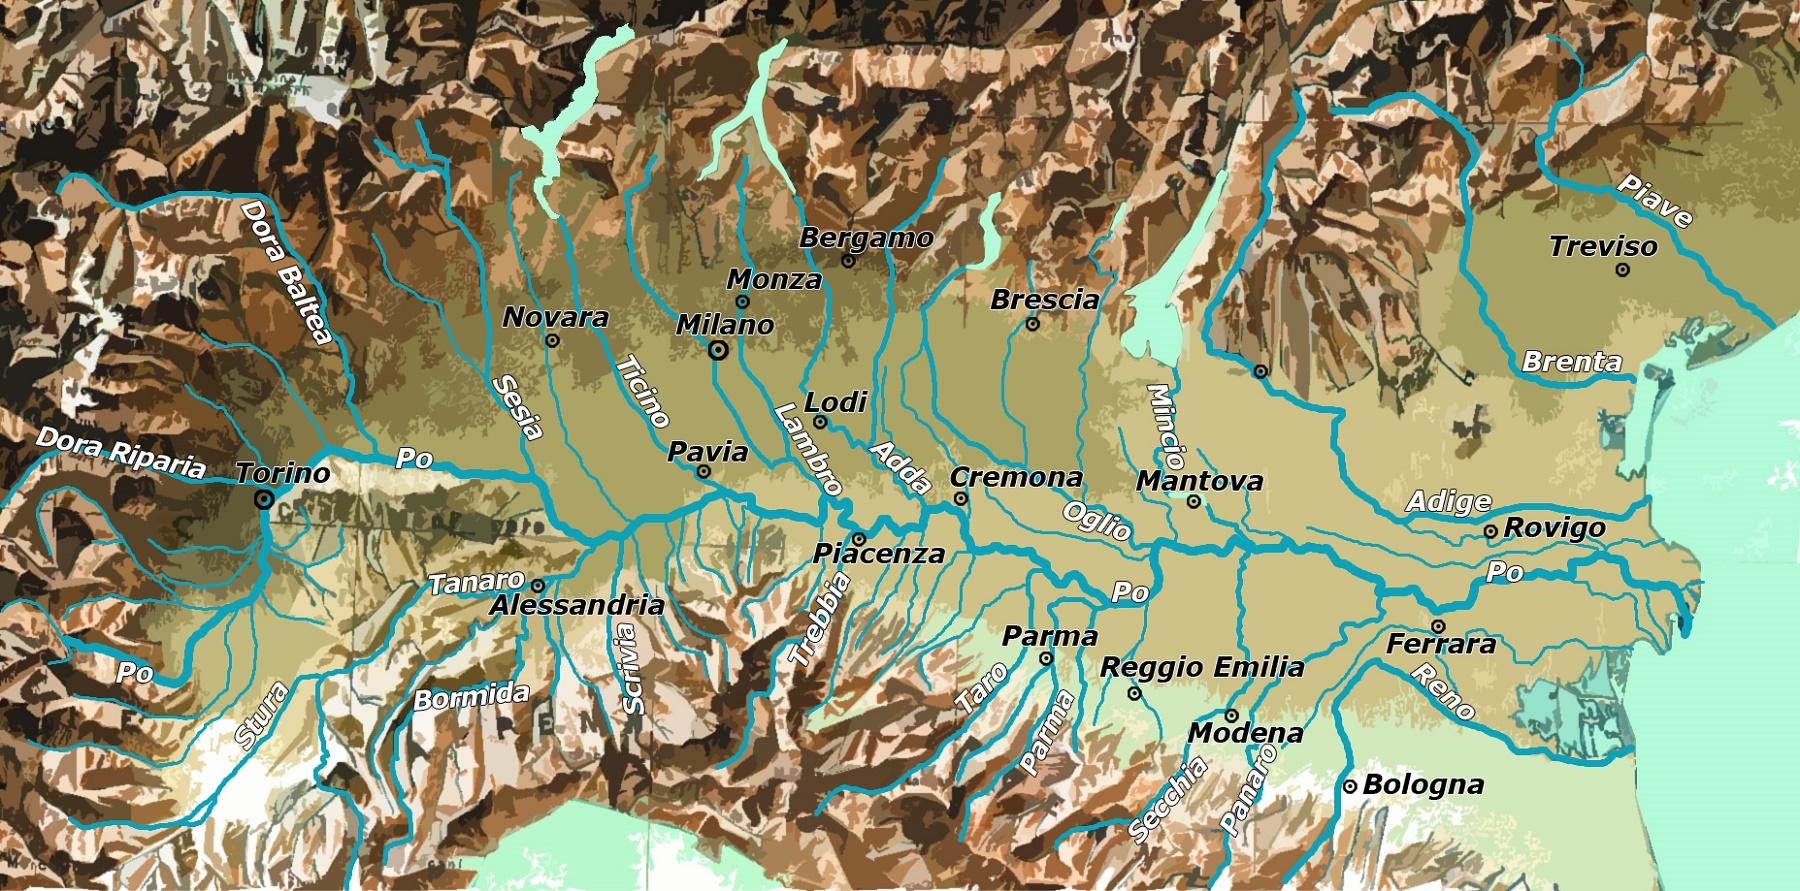 Bologna Cartina Politica.Pianura Padana Cartina Fisica E Cartina Politica Viaggi E Vacanze